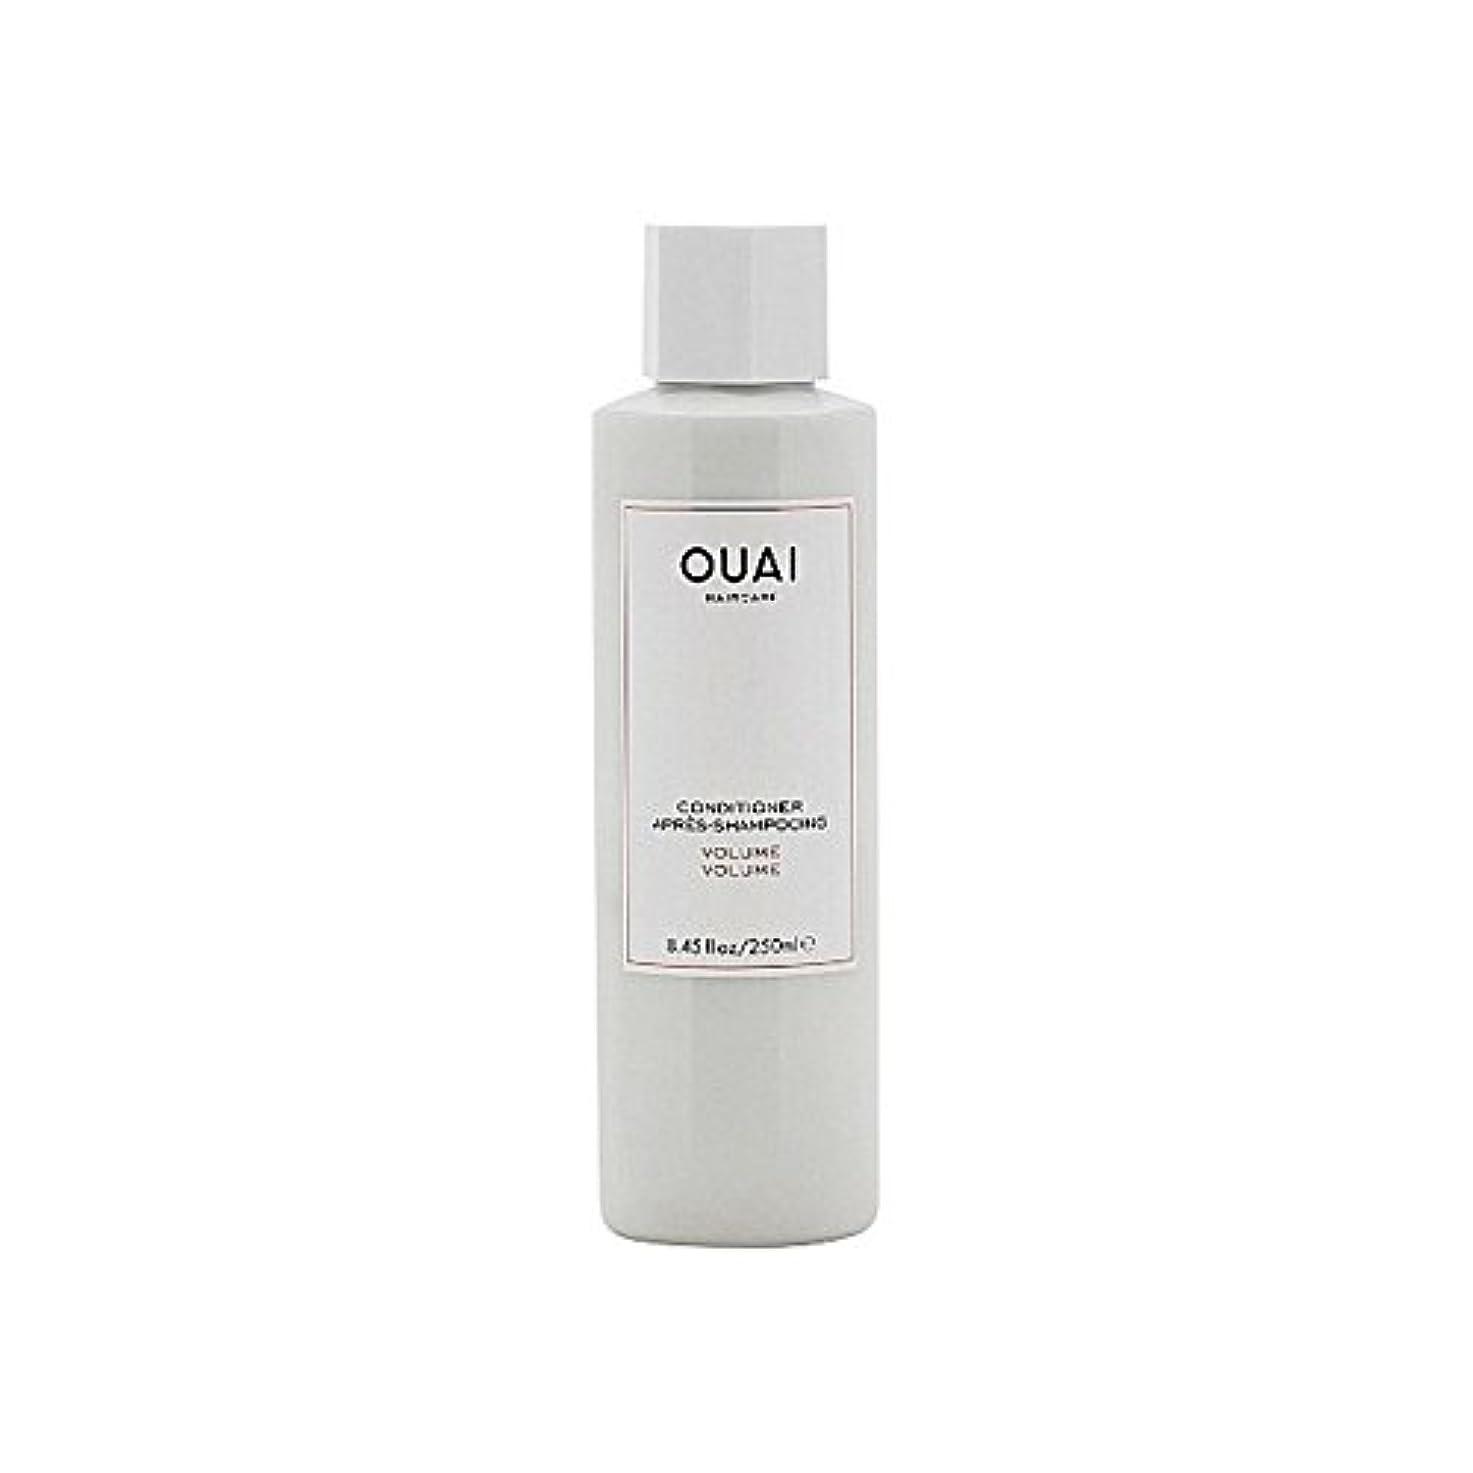 Ouai Volume Conditioner 250ml - ボリュームコンディショナー250 [並行輸入品]